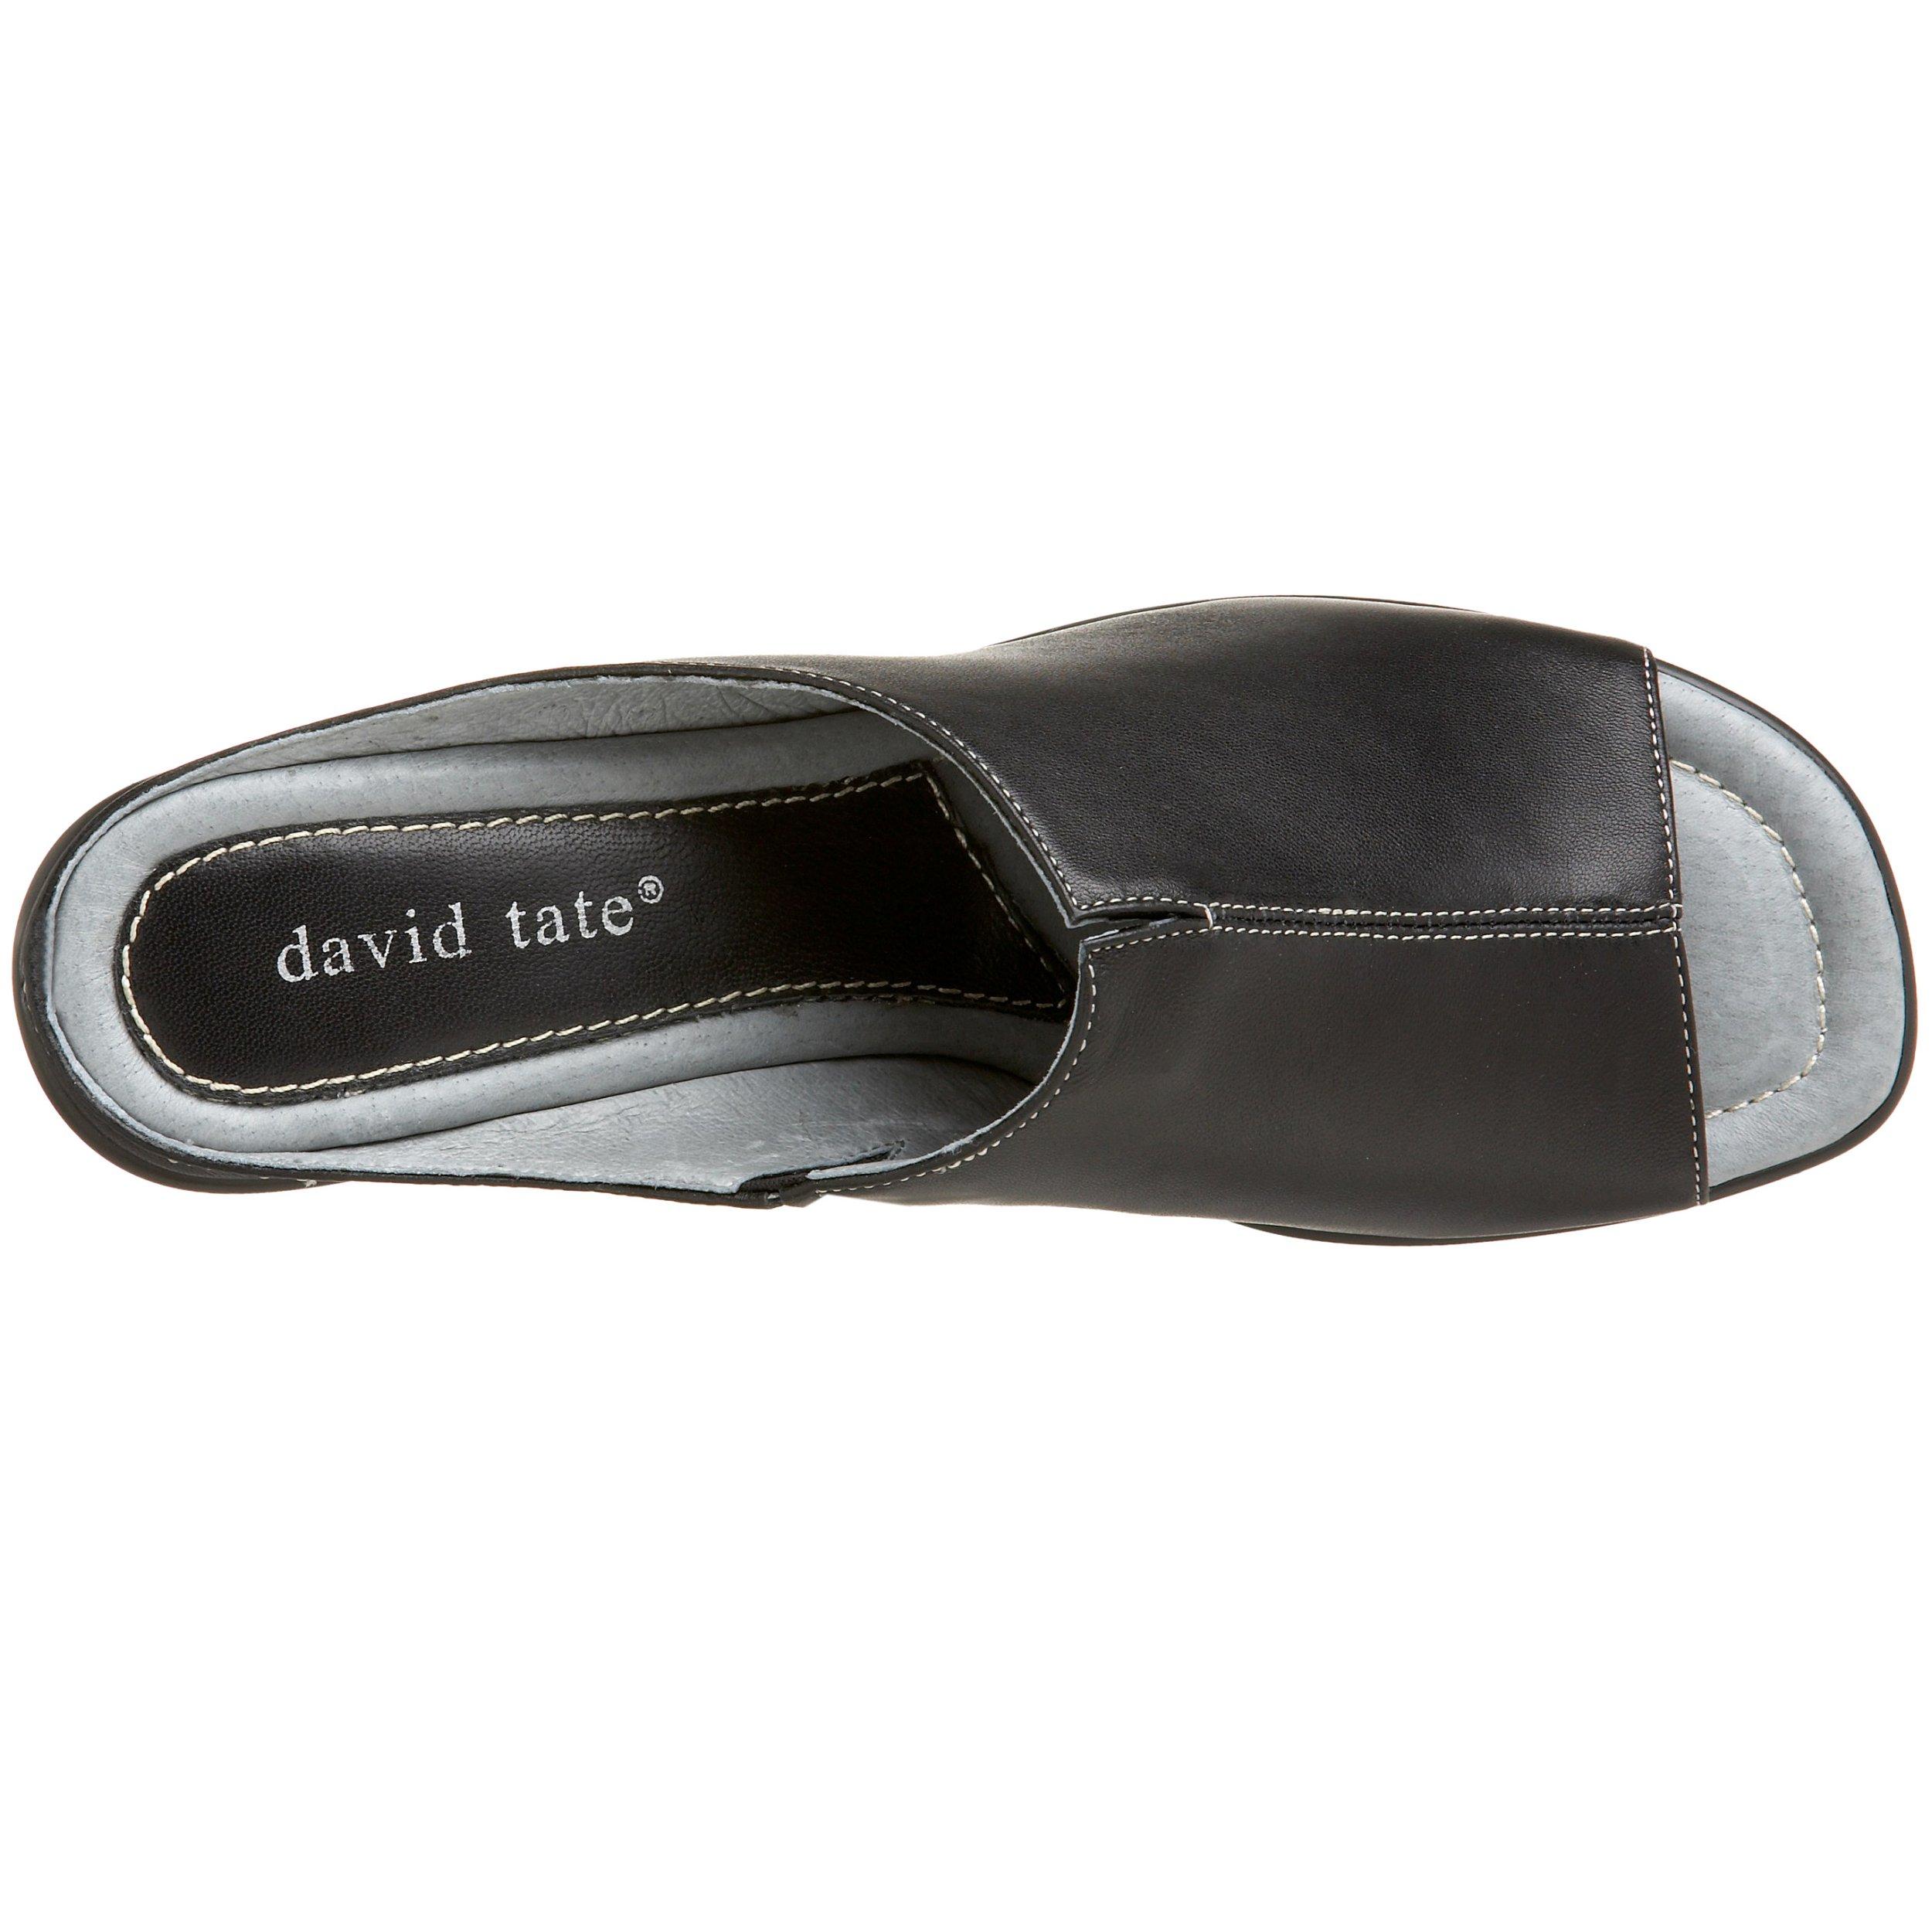 David Tate Women's Gloria Slide Sandal,Black Lamb,7 M US by David Tate (Image #7)